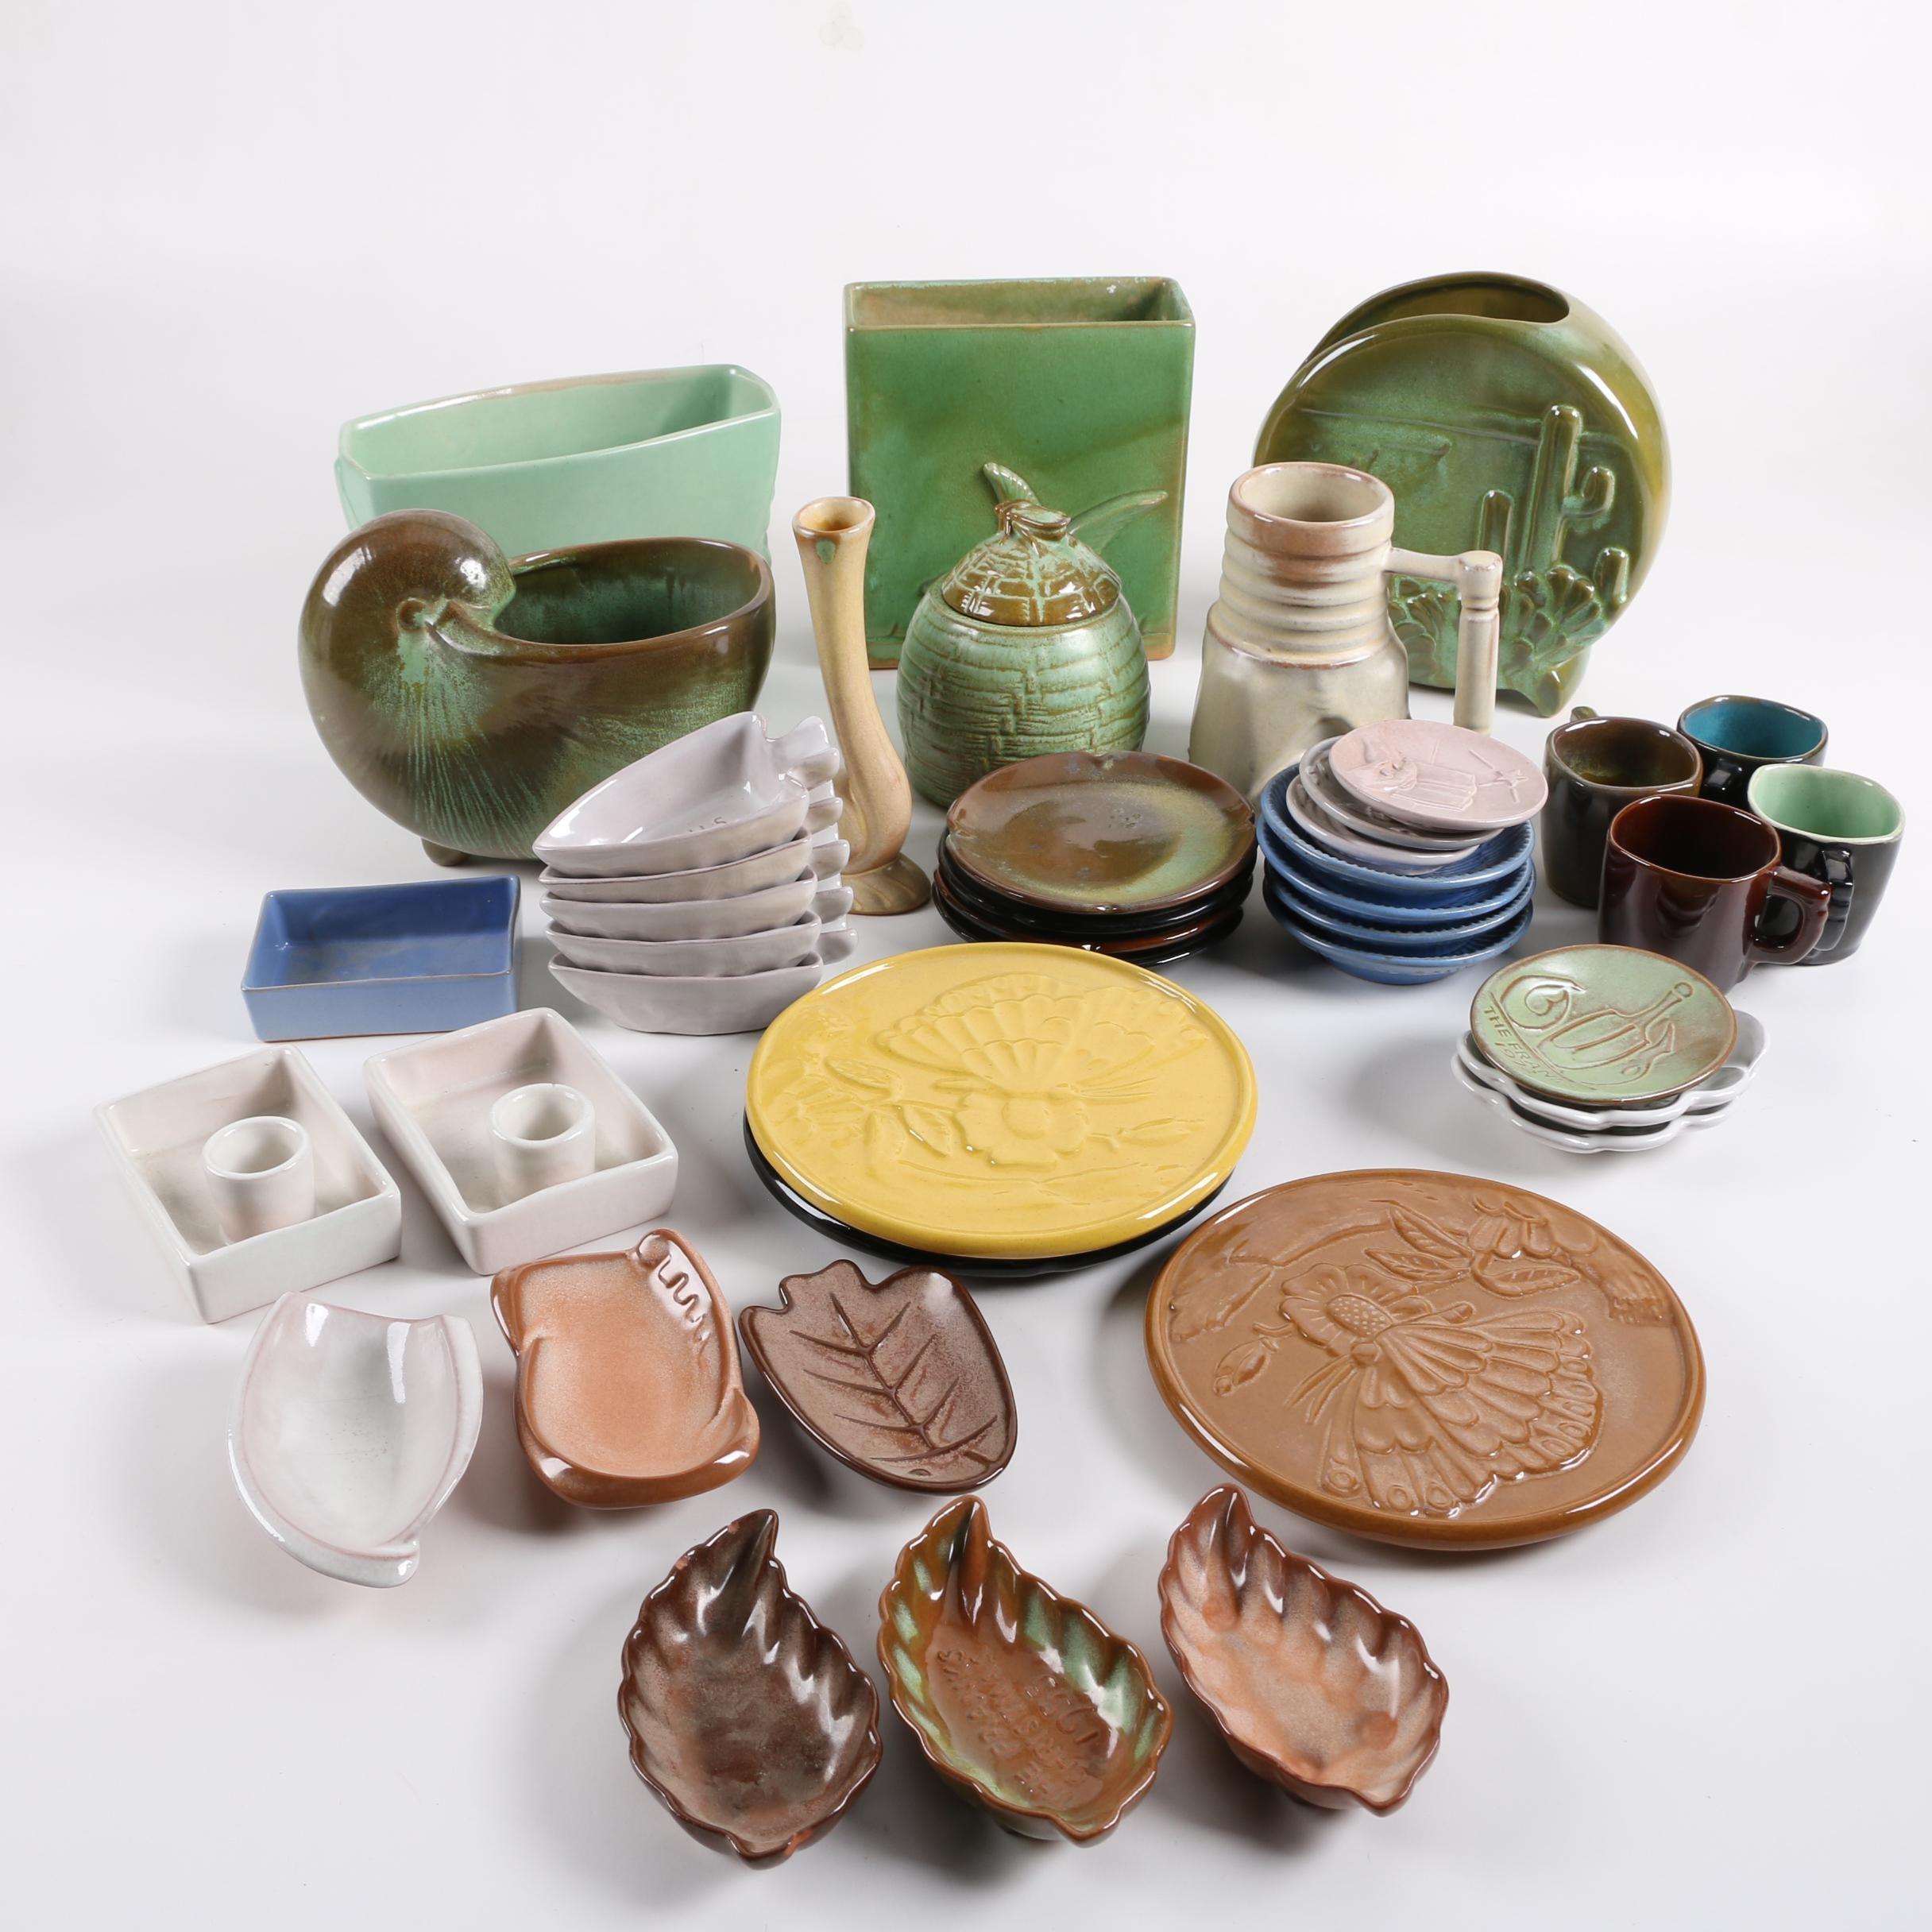 Vintage Frankoma Pottery Vases, Trivets, and Other Decor